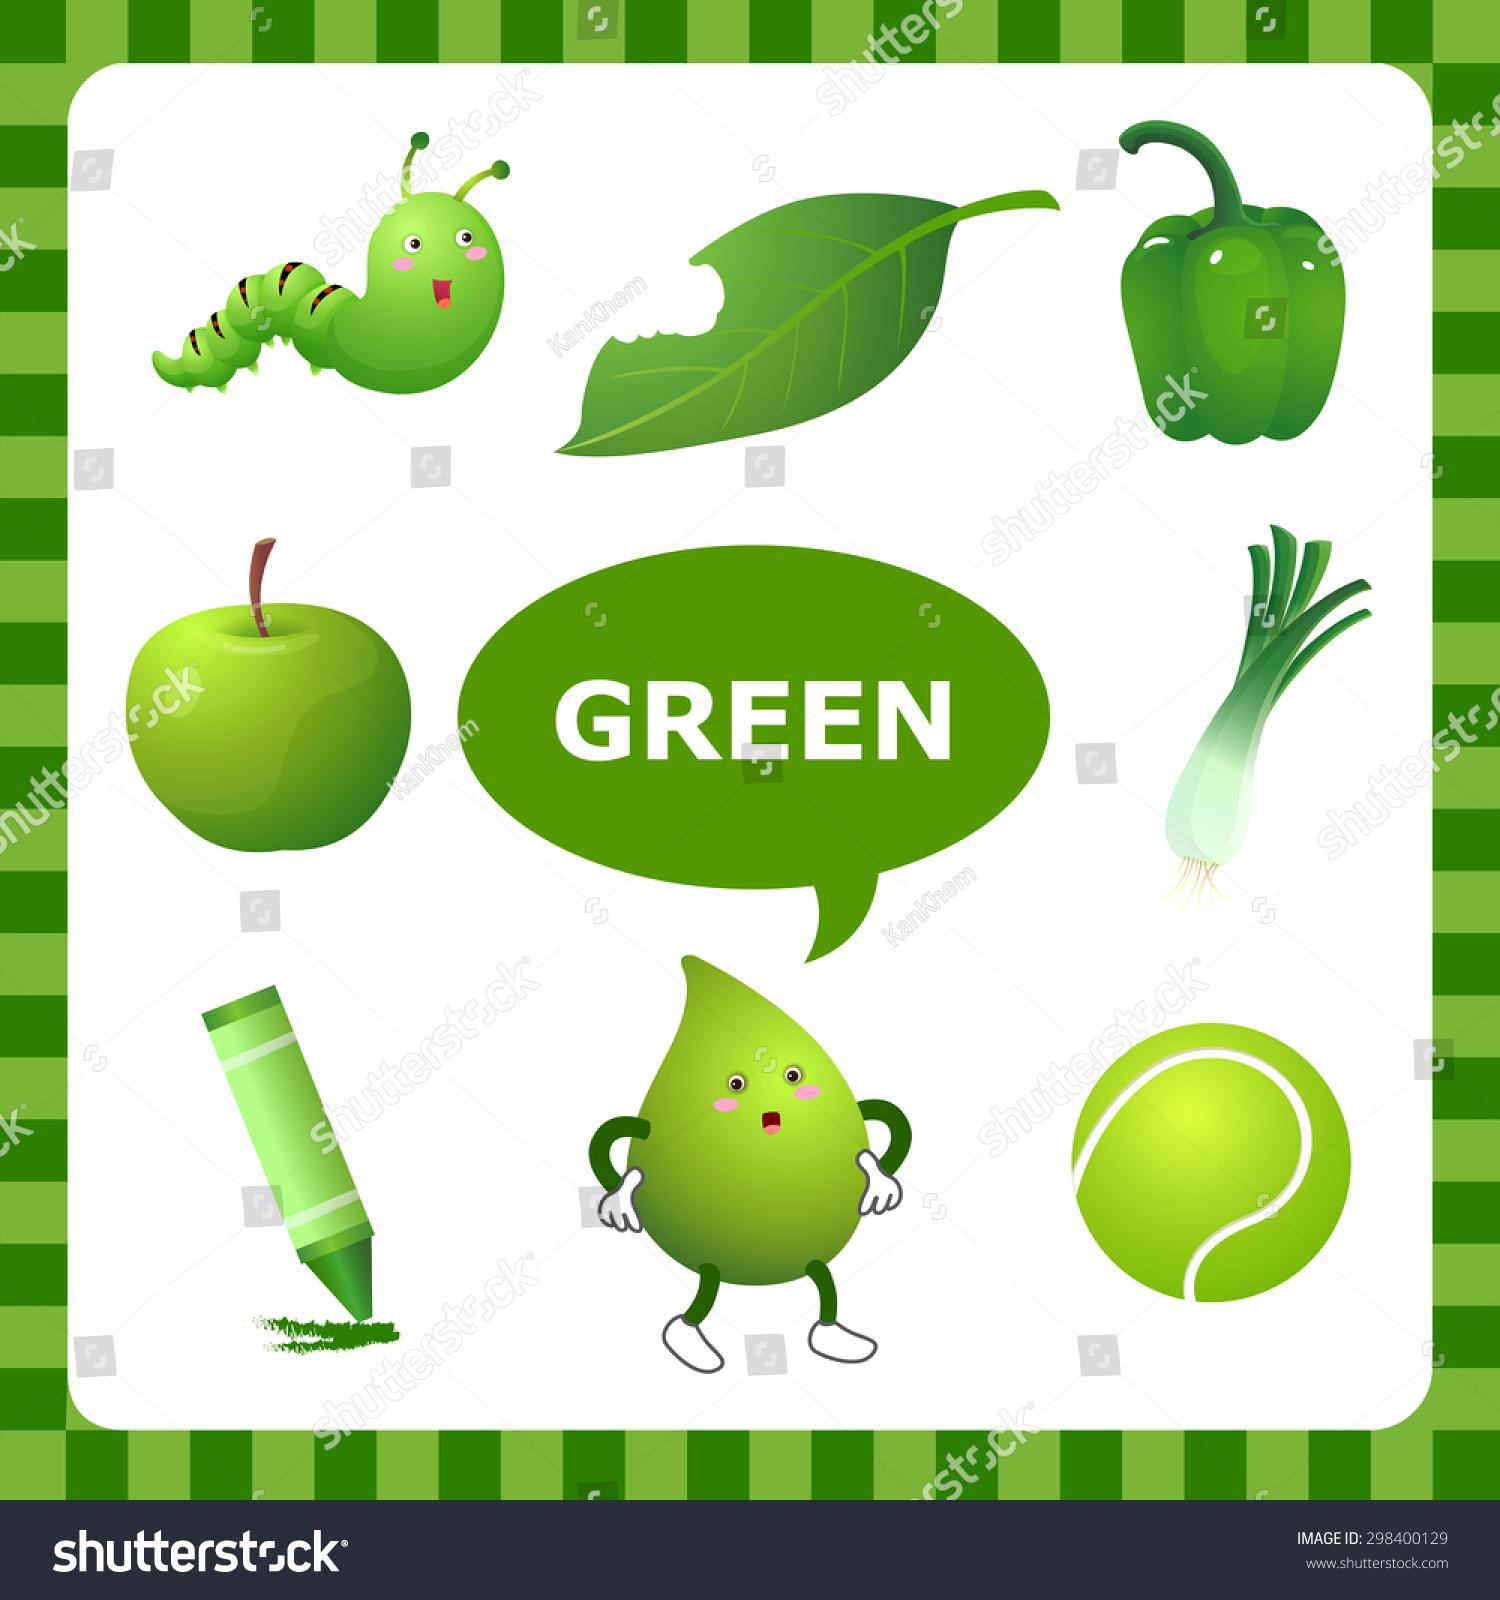 the Color Green Images Clip Art | colorimage.website